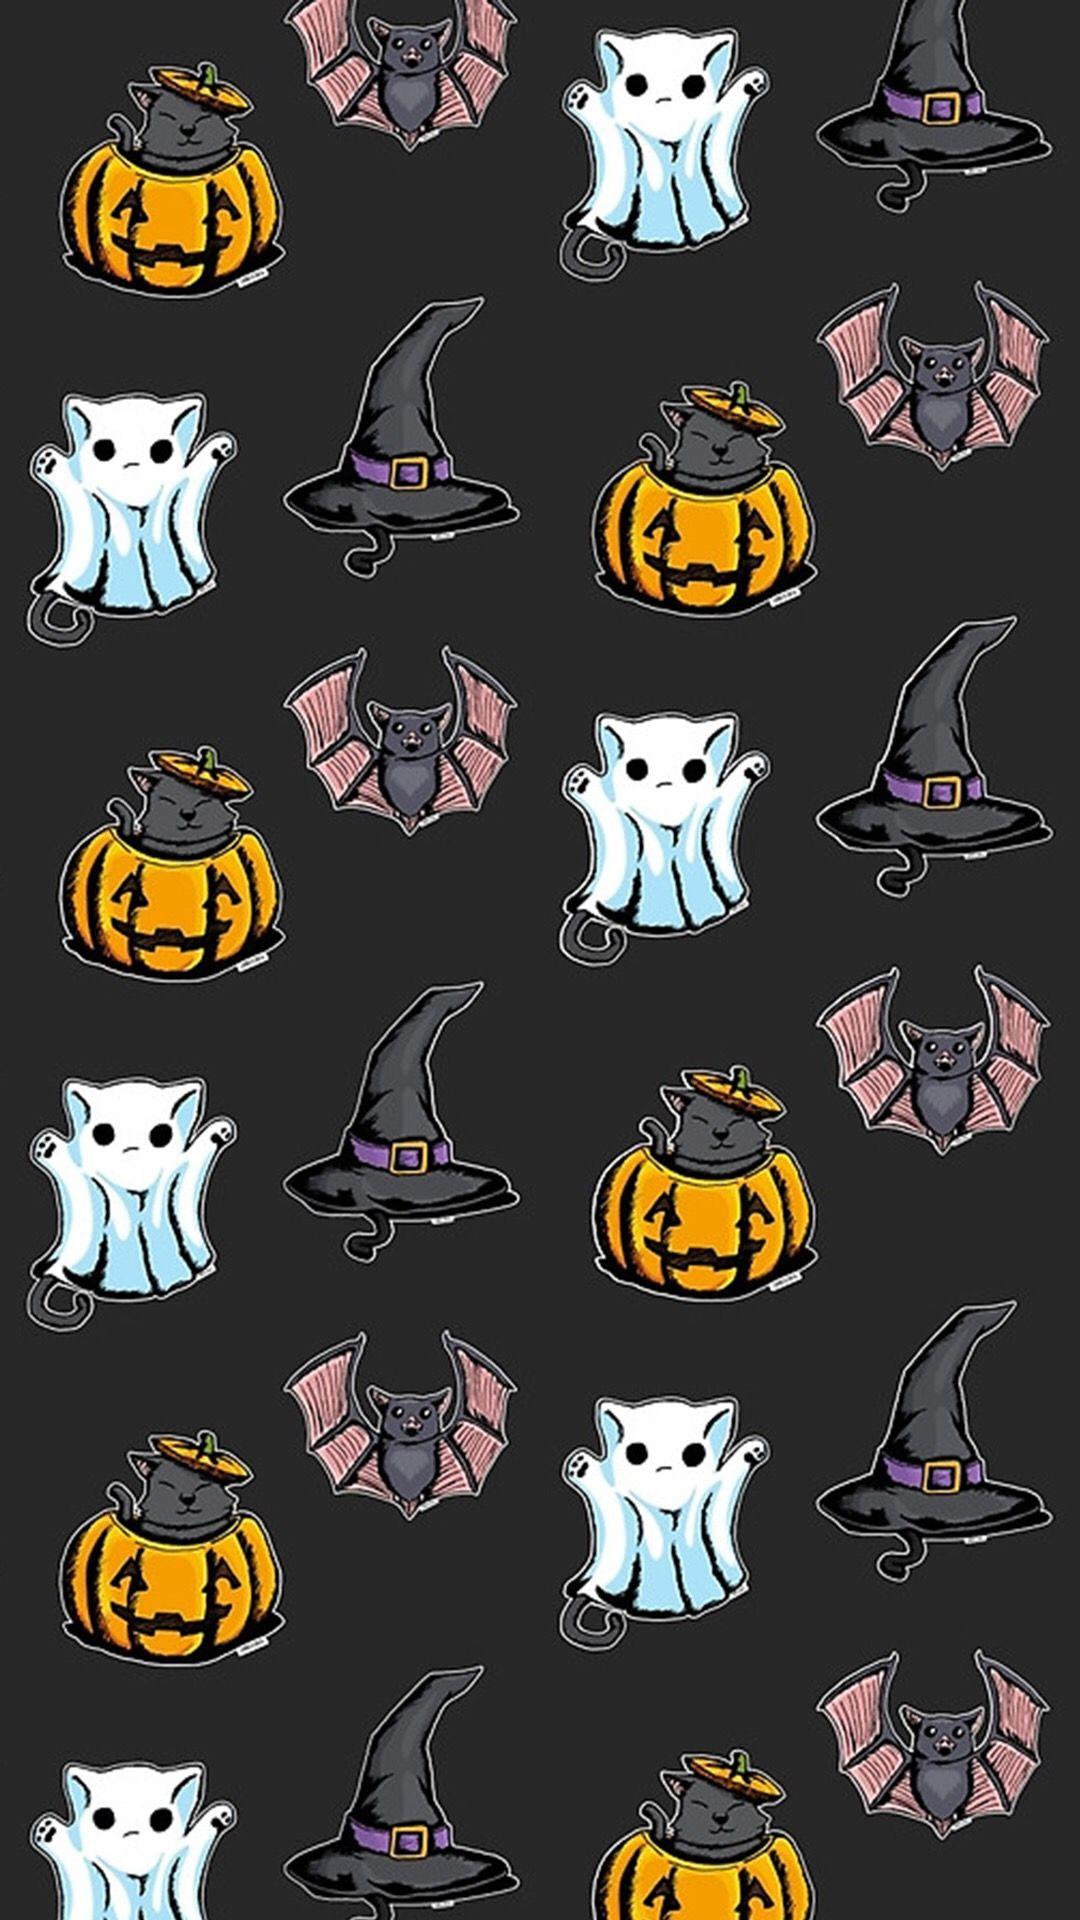 Pin by Amber on Halloween/Fall Halloween wallpaper